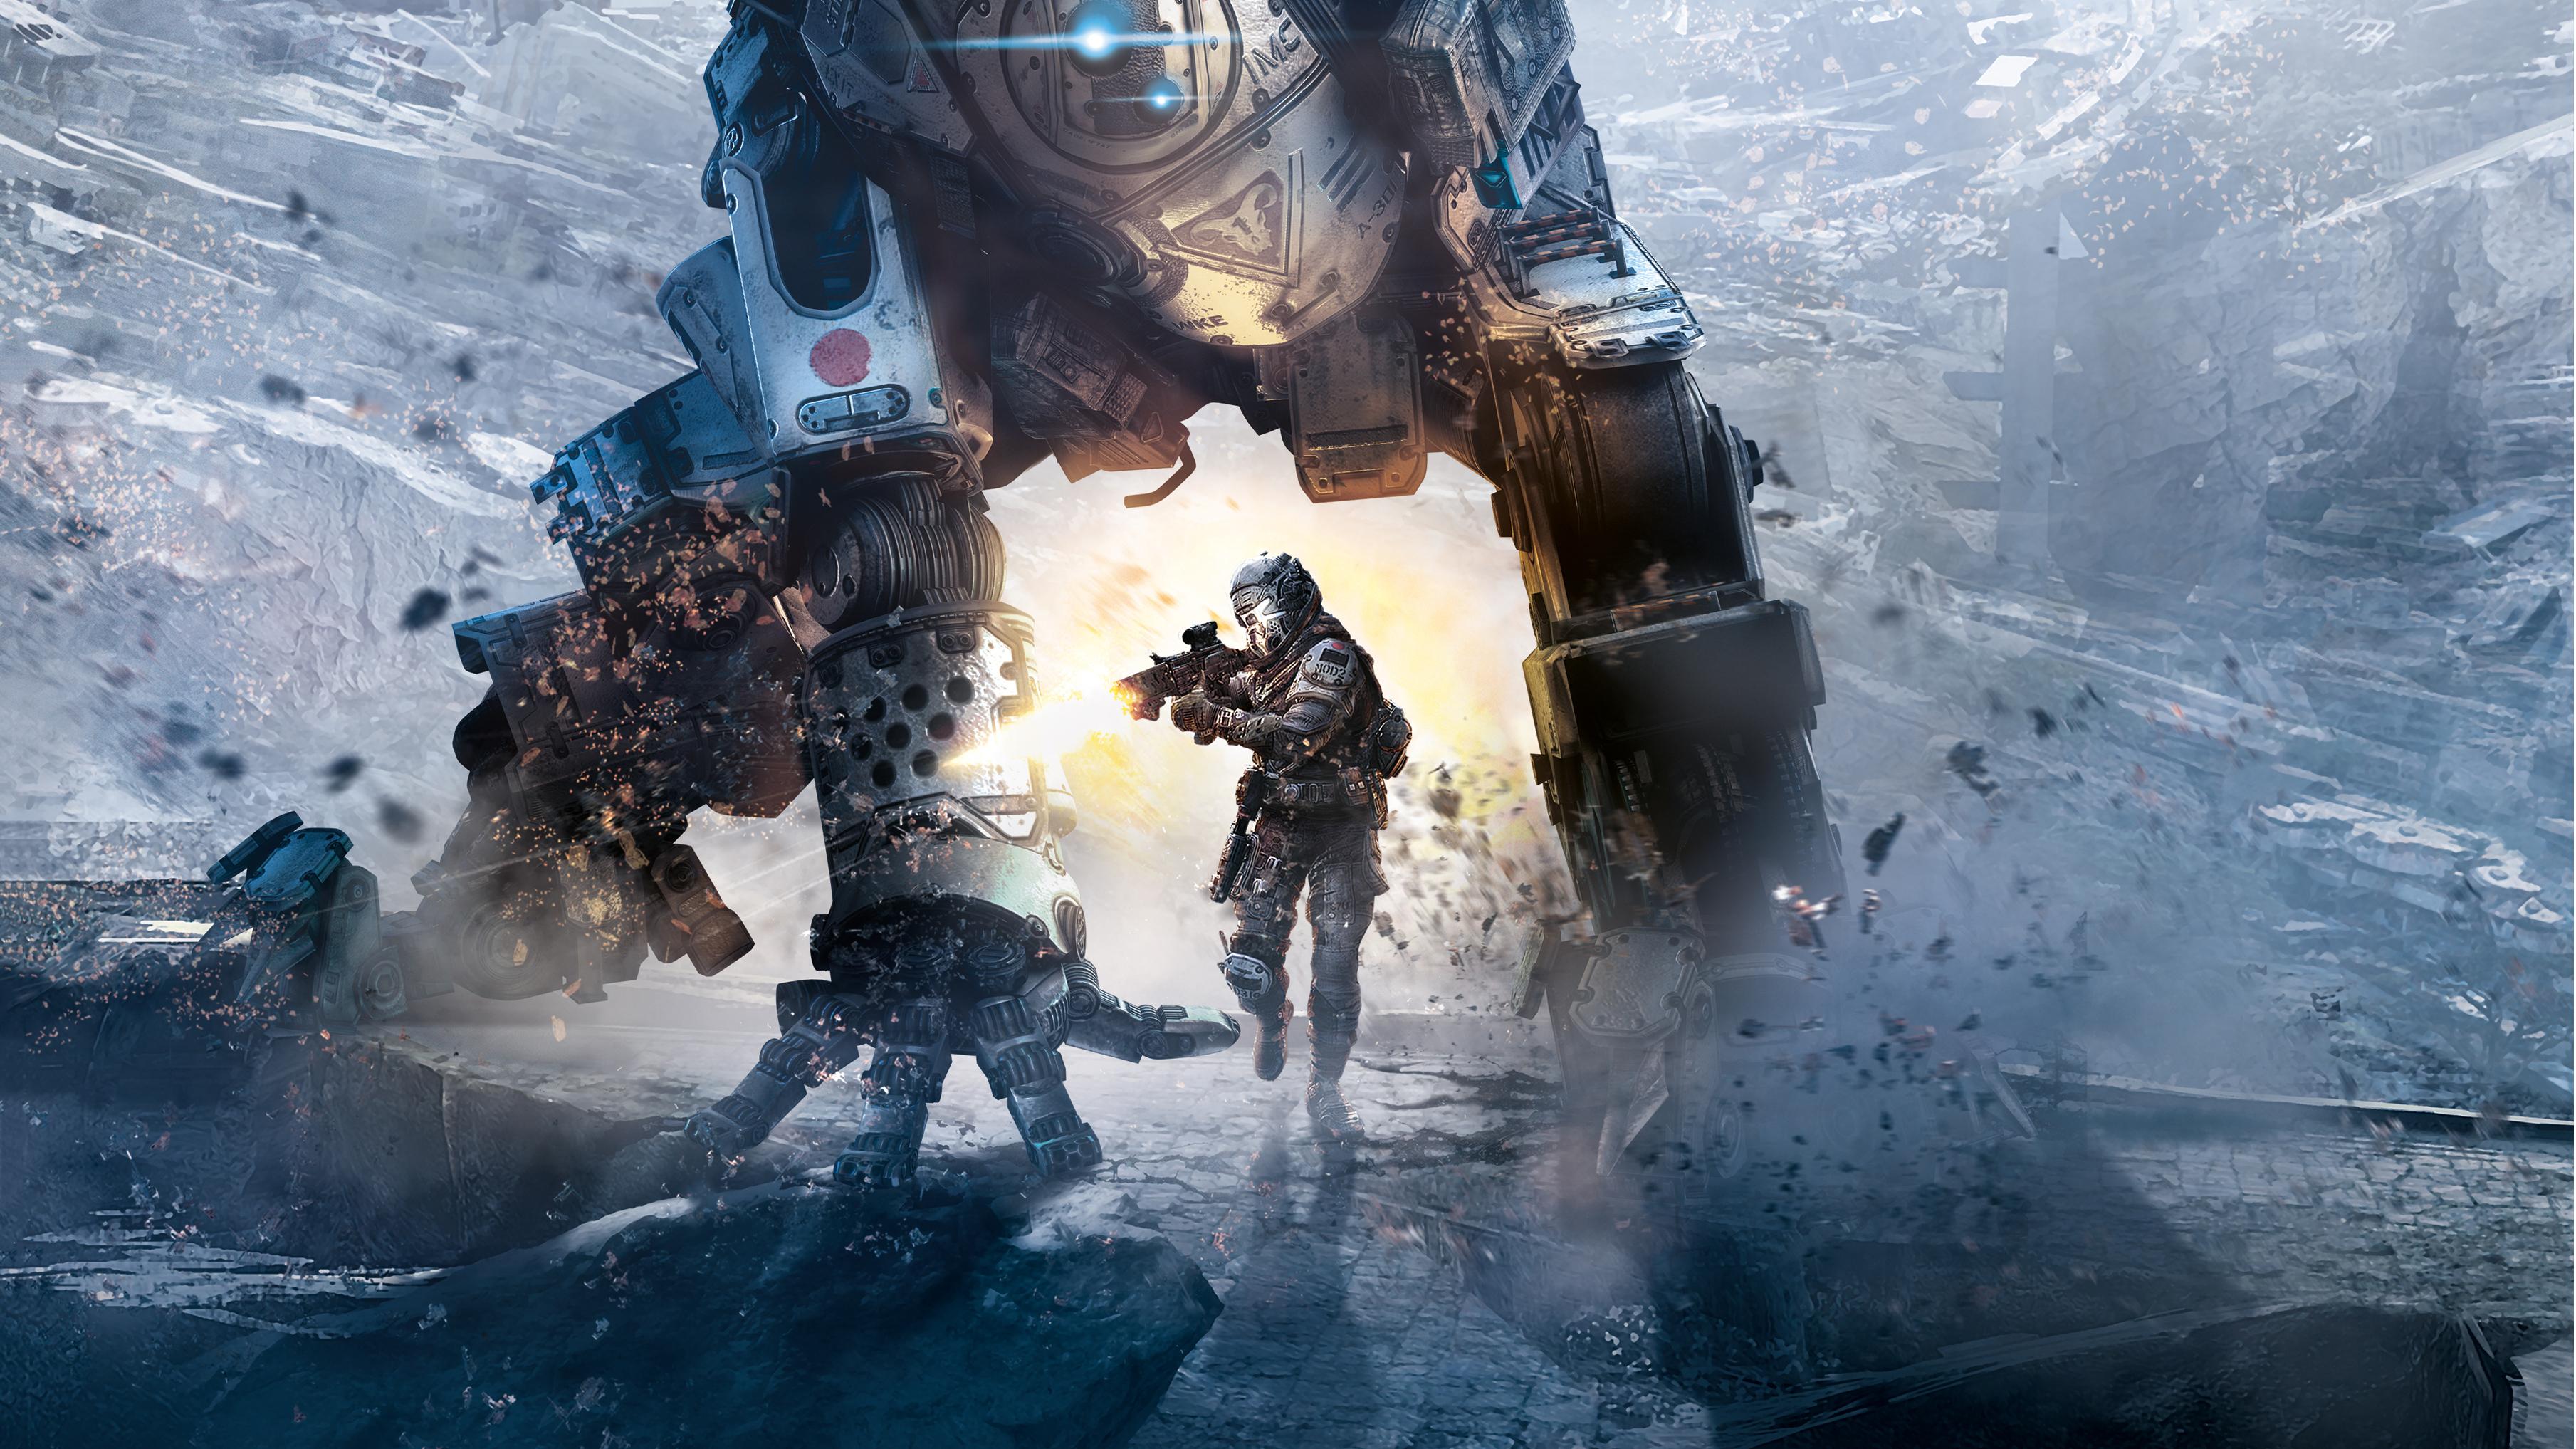 Titanfall 2 Game Poster Wallpaper, HD Games 4K Wallpapers ...